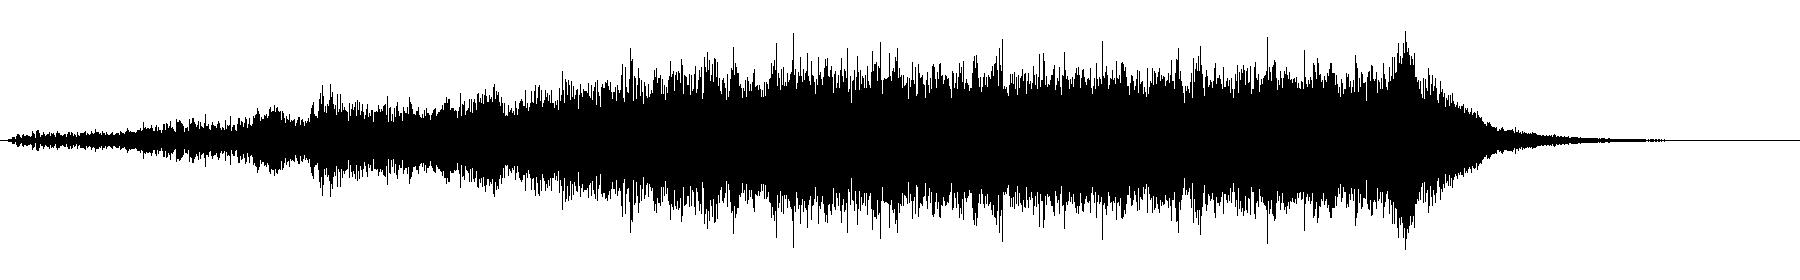 str fx b 12 xc